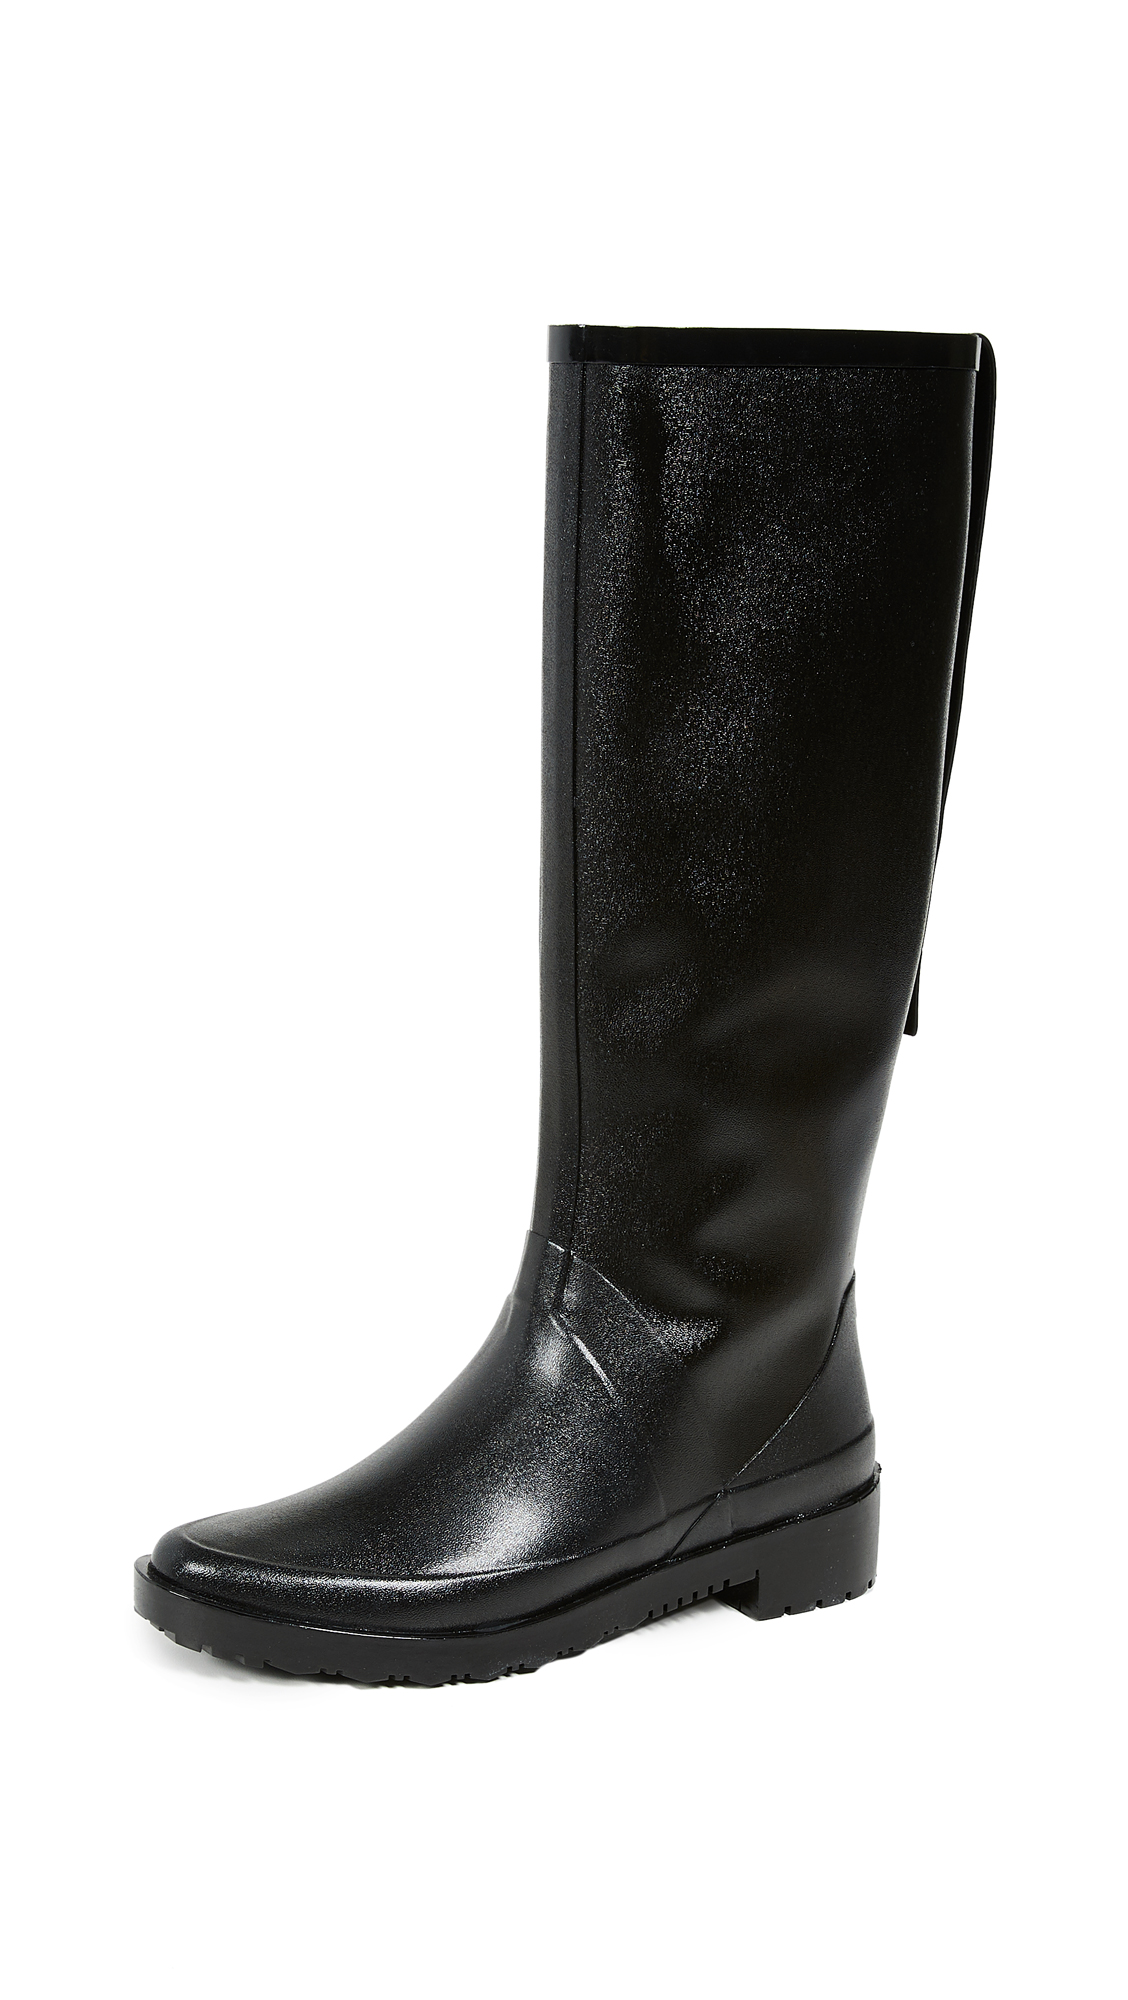 Stuart Weitzman Griffin Boots